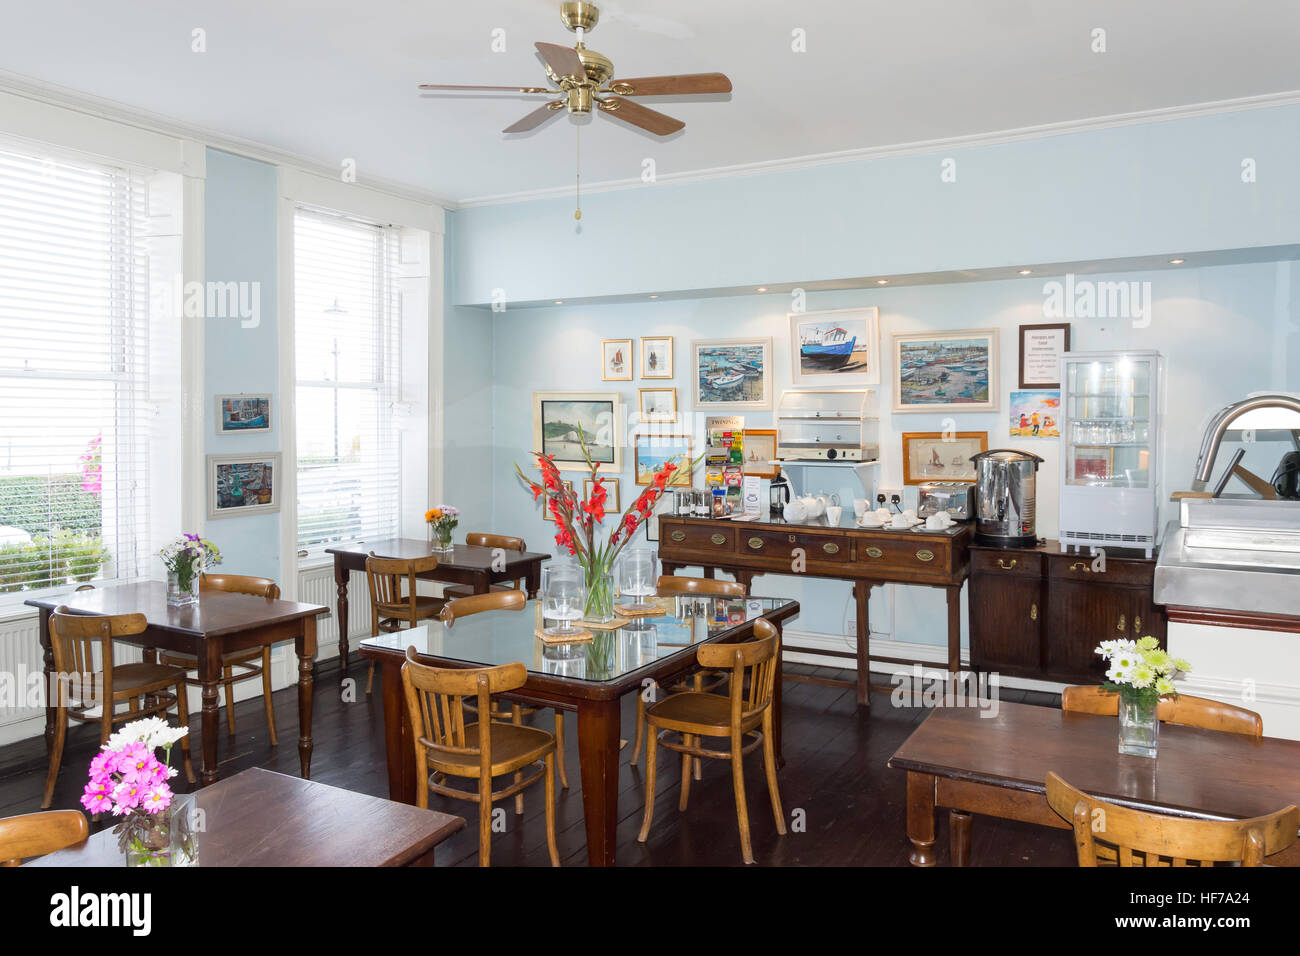 Comedor en el Hotel Royal Harbour, Nelson Crescent, Ramsgate, isla de Thanet, Kent, Inglaterra, Reino Unido Foto de stock